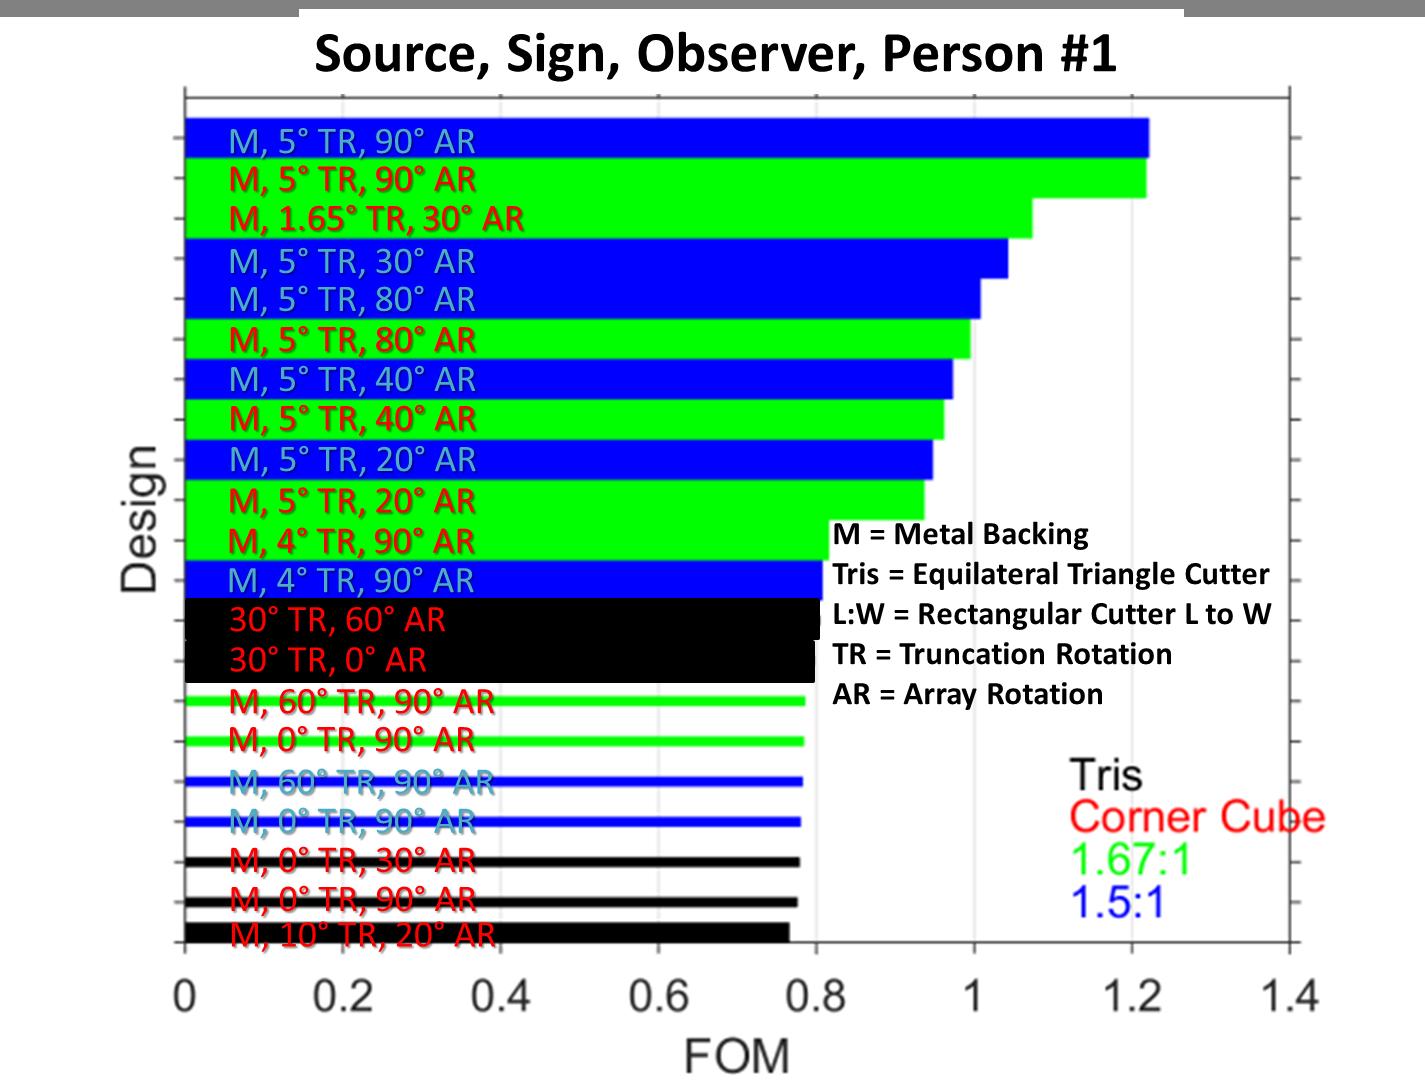 Figure 11. Top reflective sheeting designs for scenario #3